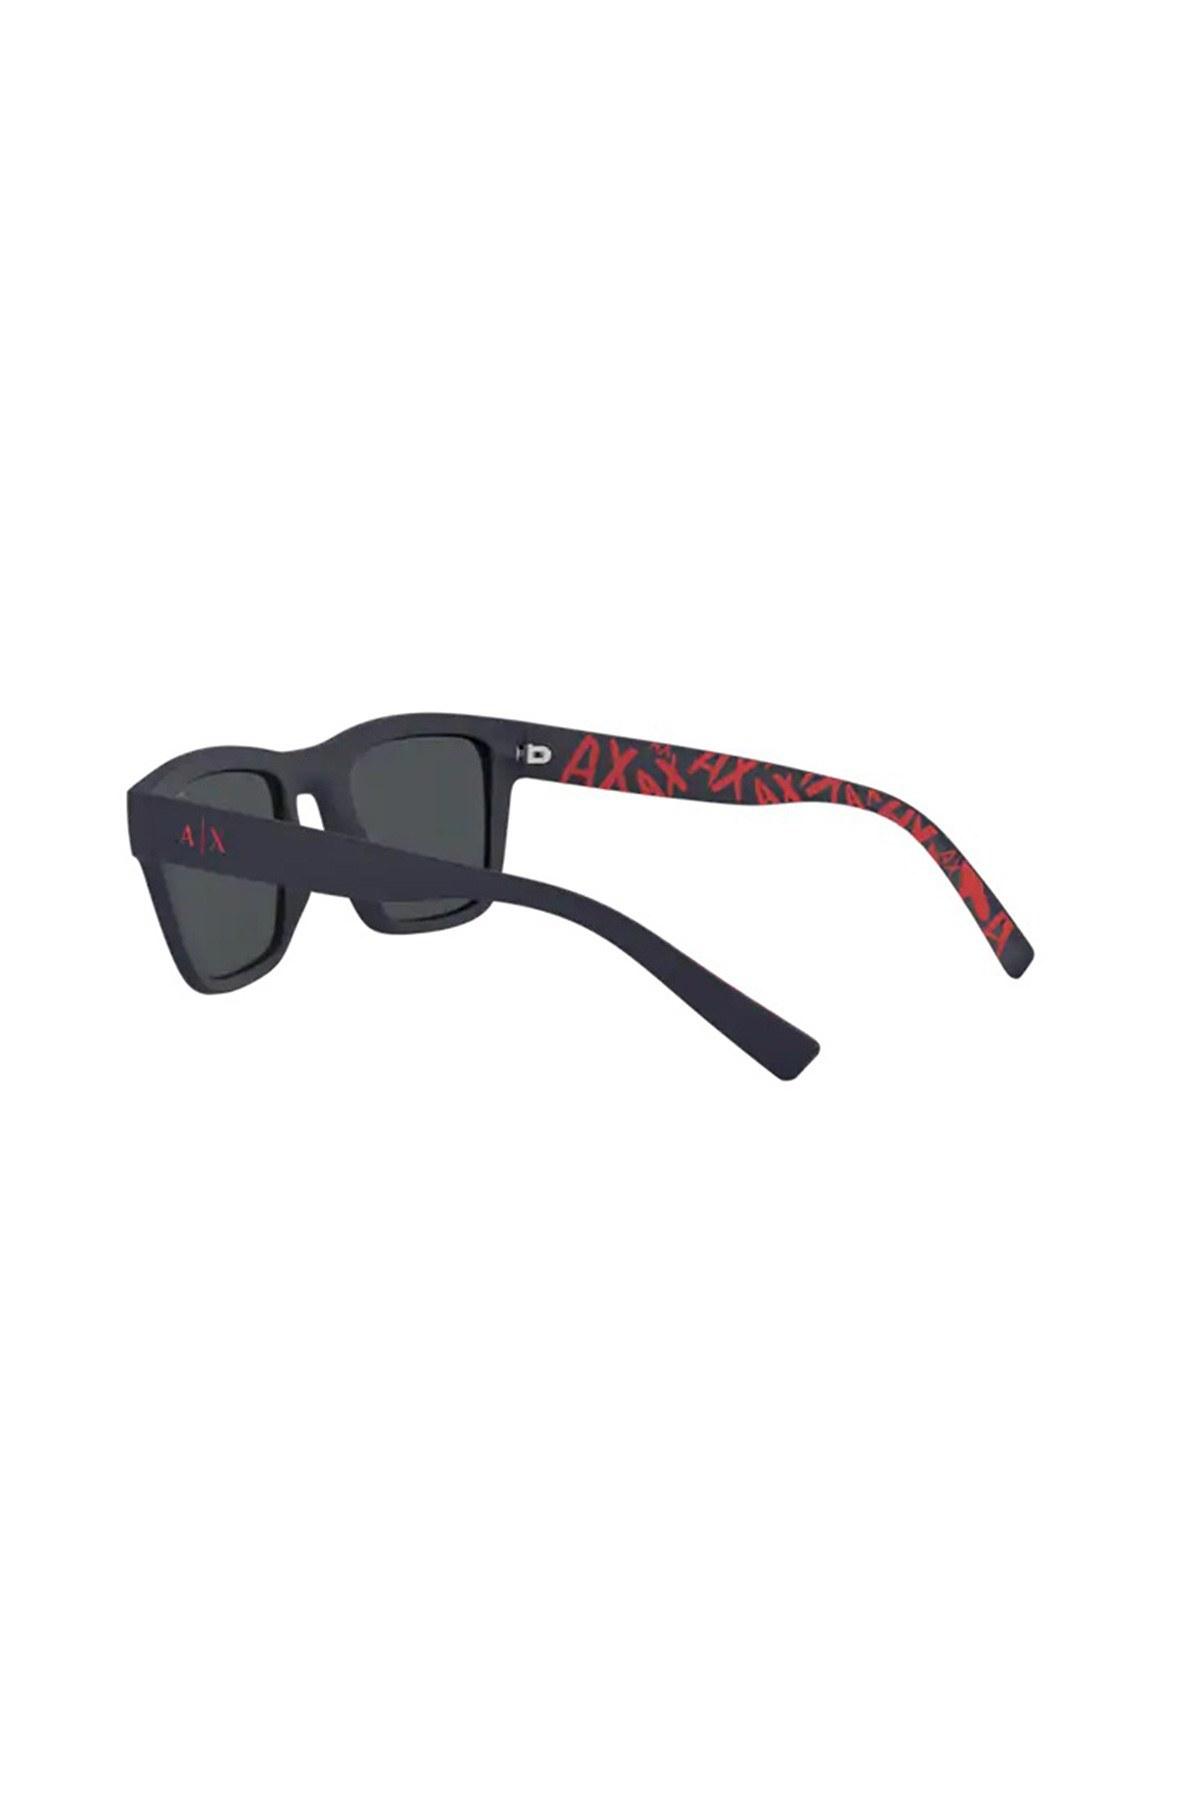 Armani Exchange Erkek Gözlük 0AX4088S 817781 52 LACİVERT